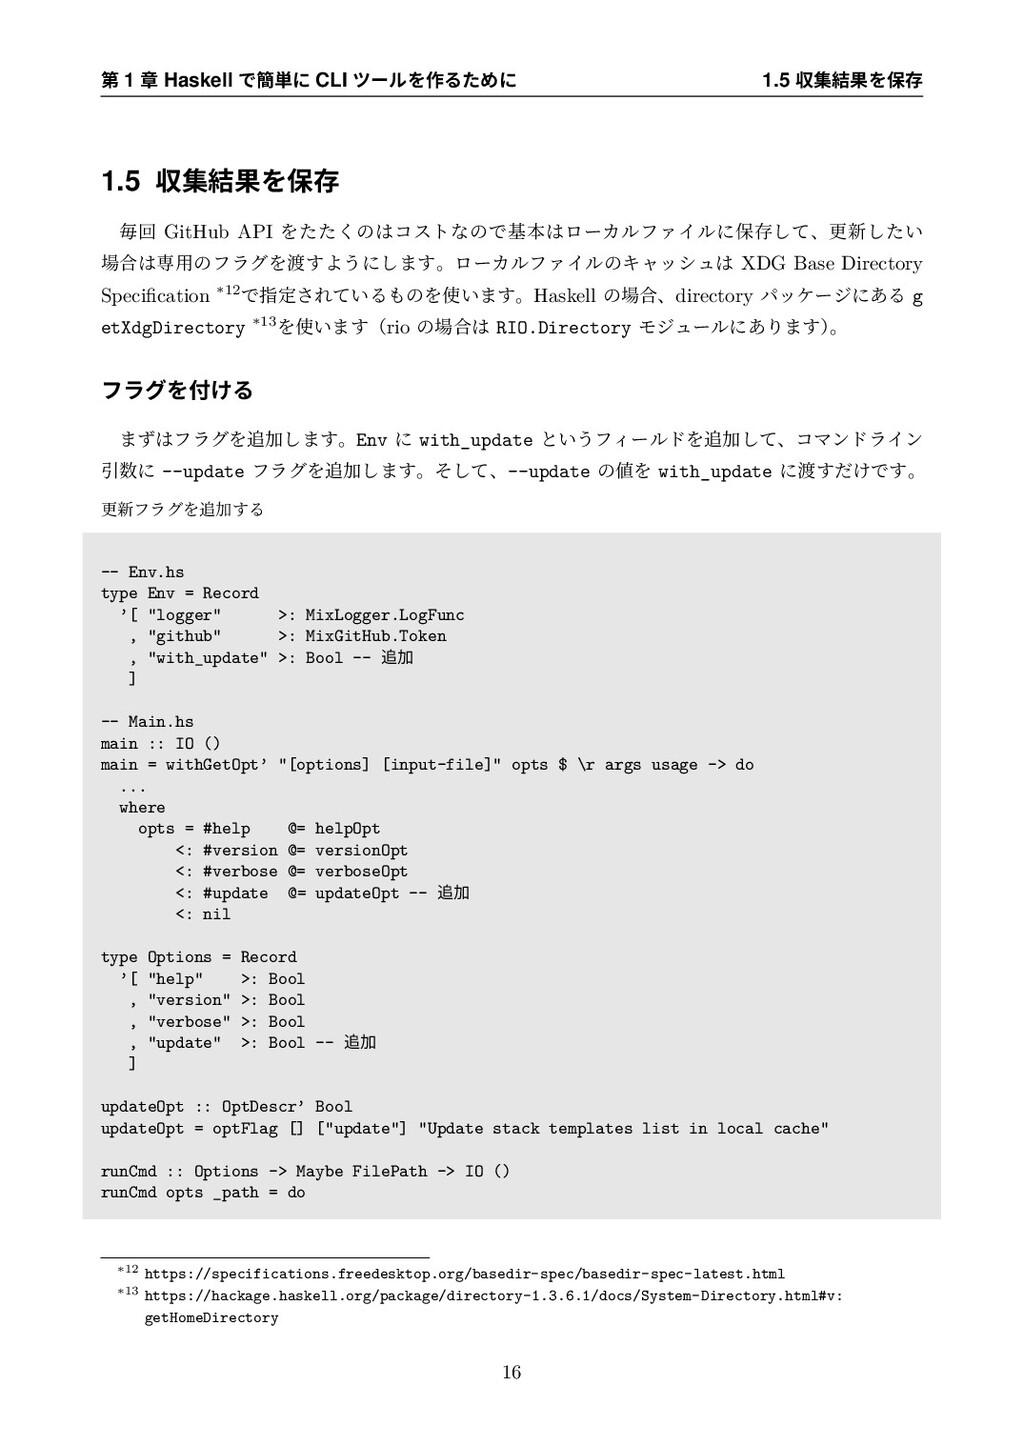 ୈ 1 ষ Haskell Ͱ؆୯ʹ CLI πʔϧΛ࡞ΔͨΊʹ 1.5 ऩू݁ՌΛอଘ 1....